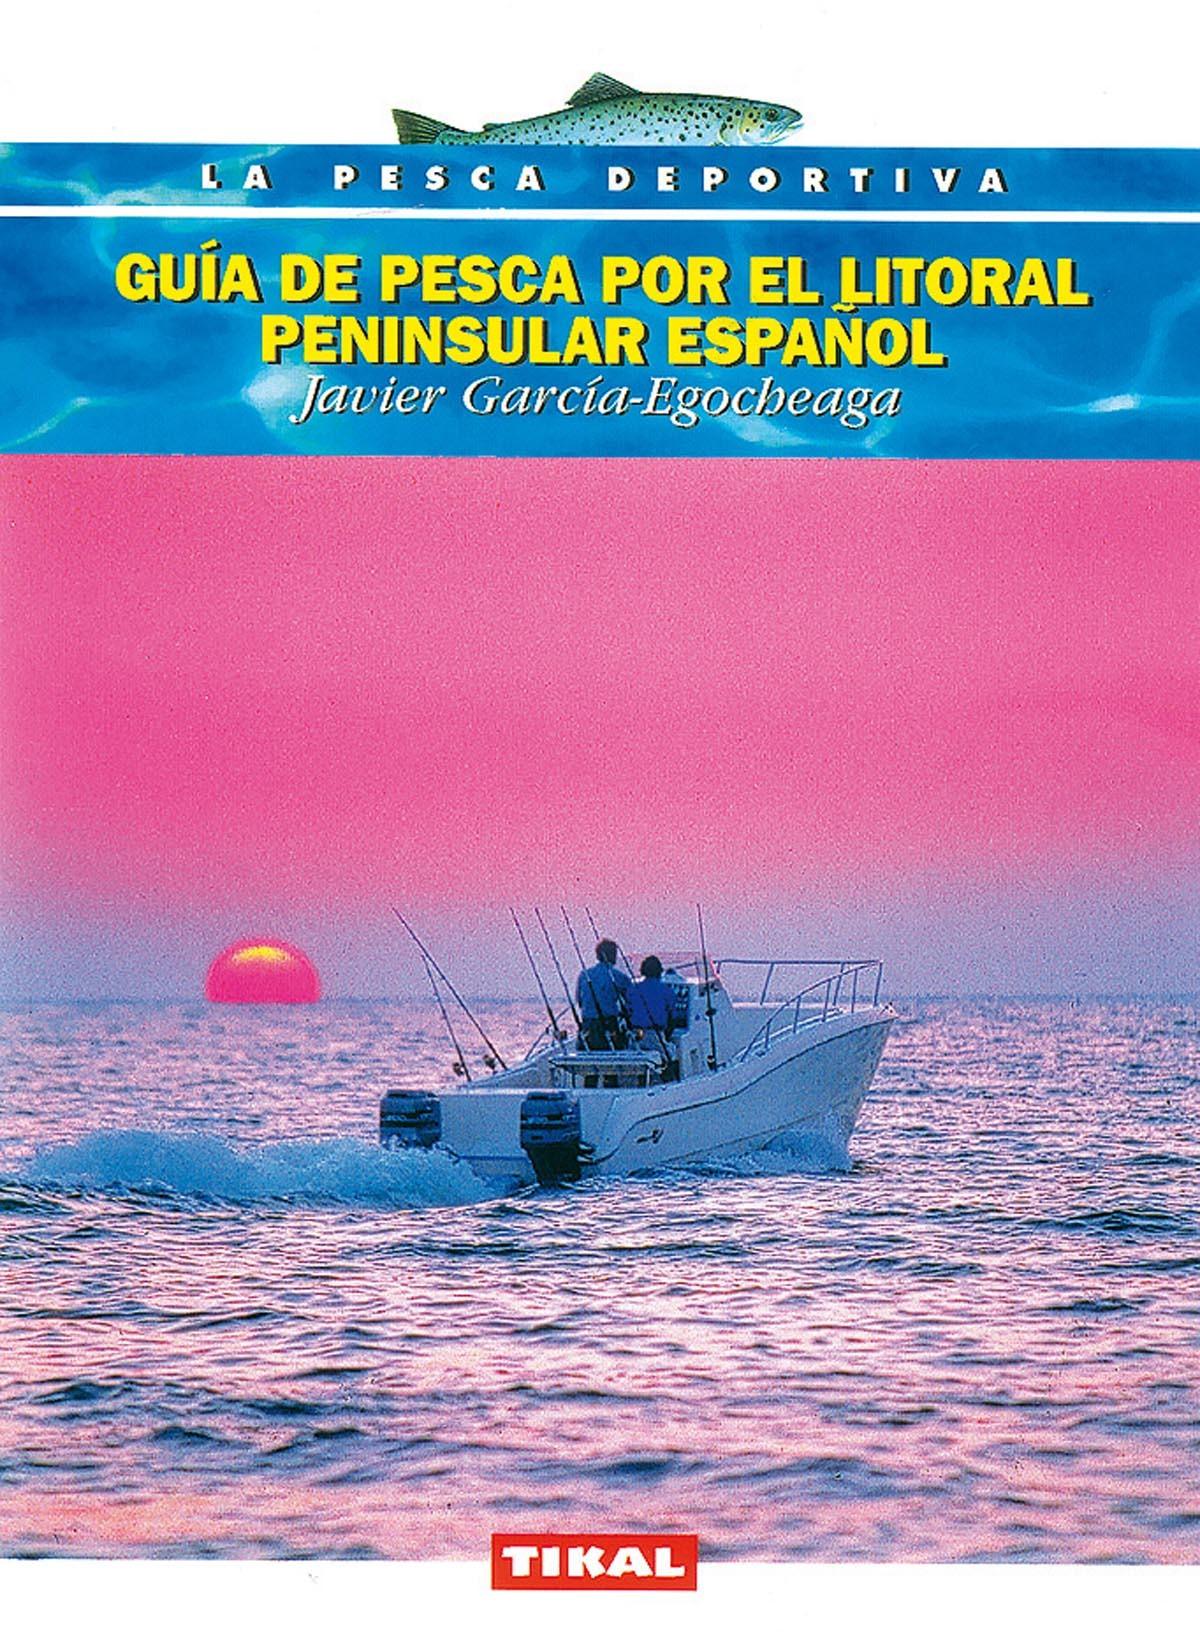 GUIA DE PESCA POR EL LITORAL PENINSULAR ESPAÑOL